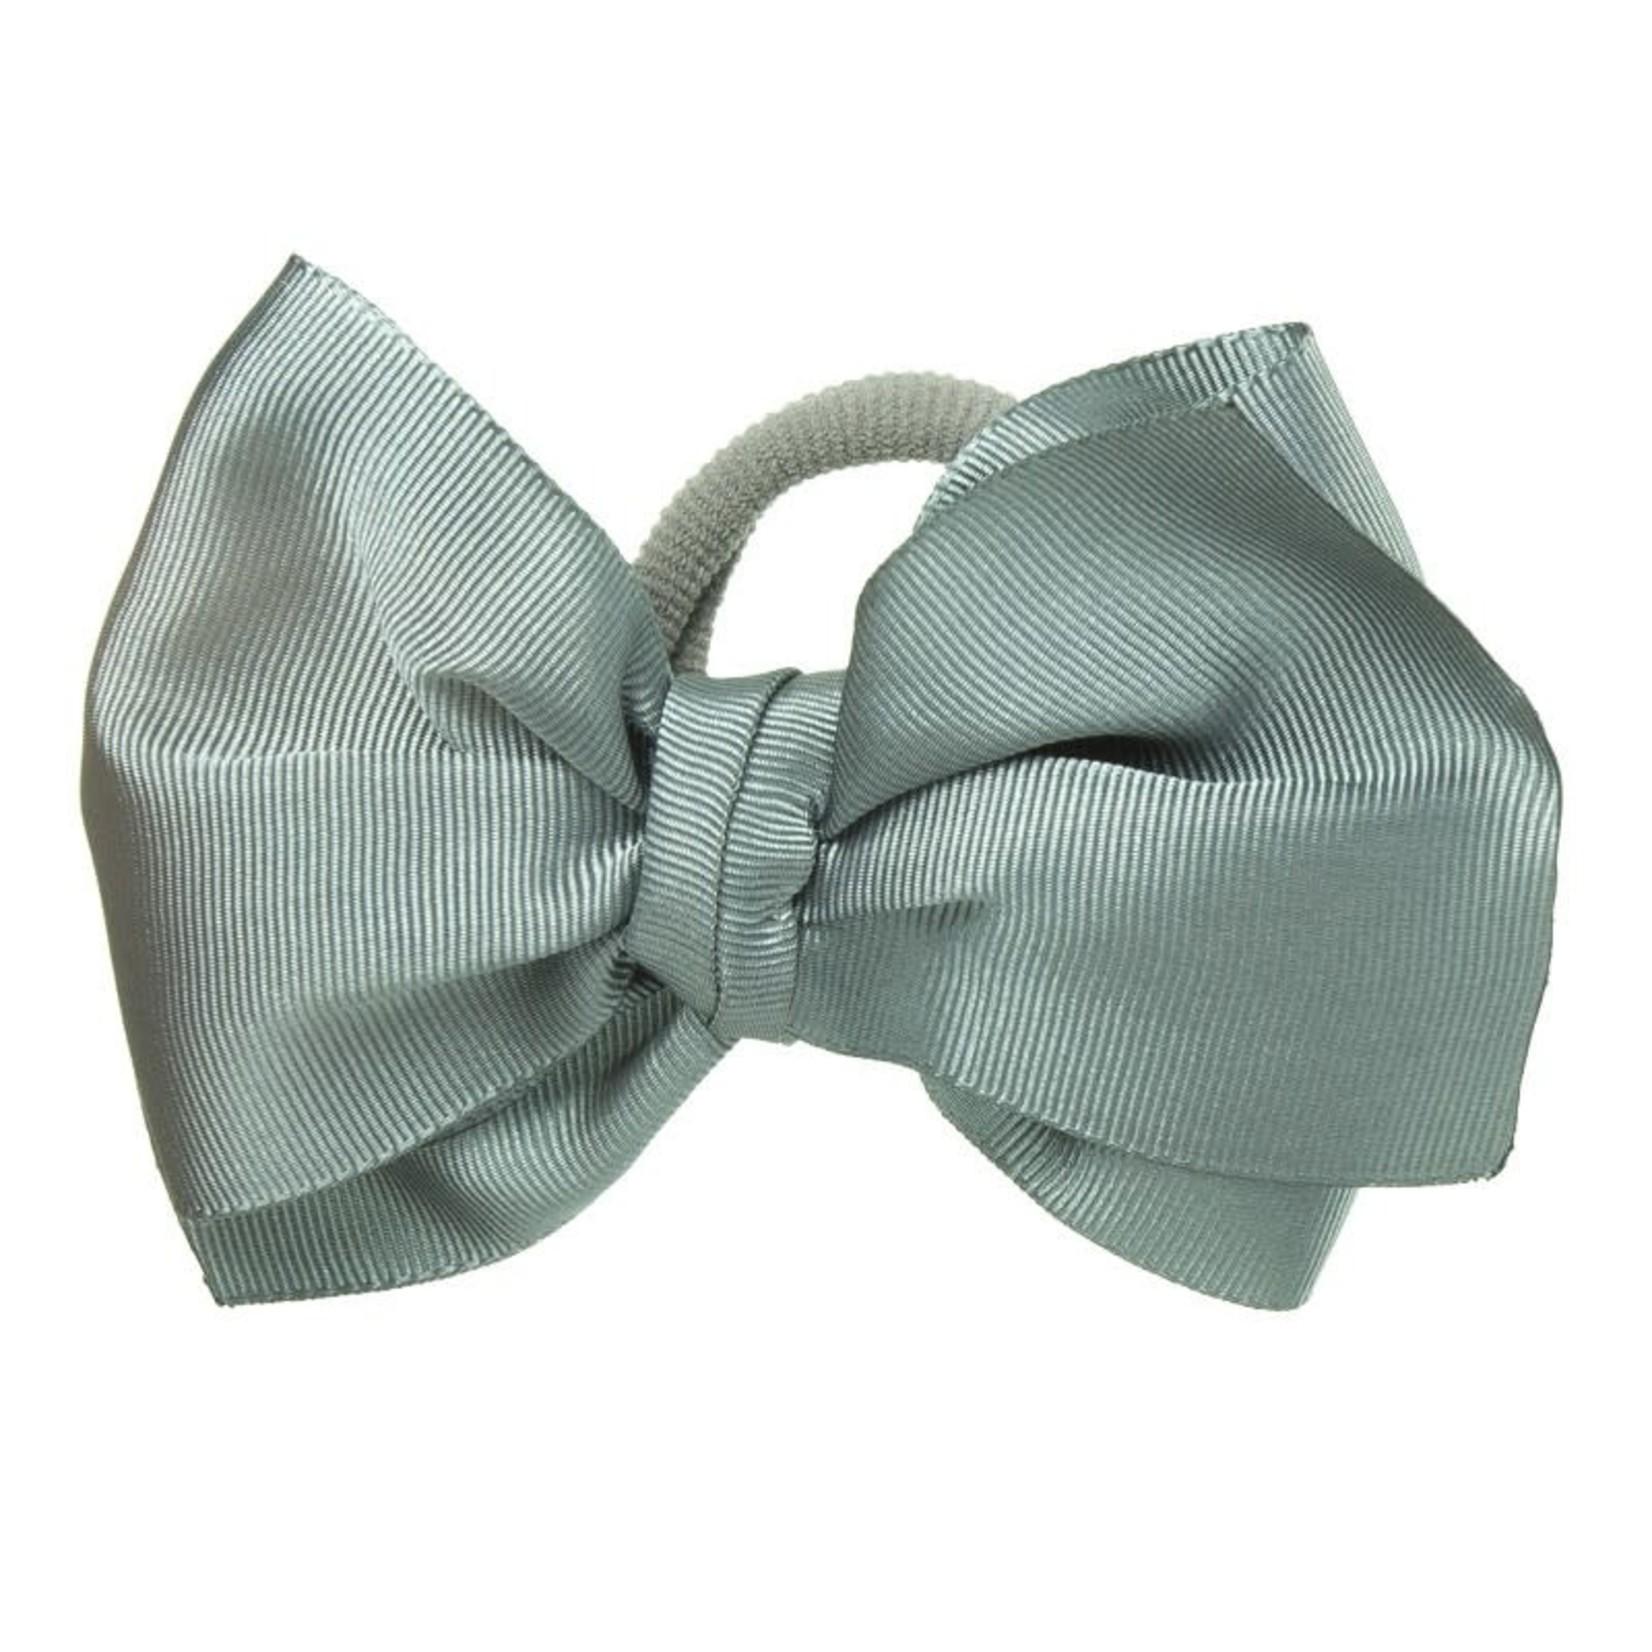 Copy of Hair Bow - Blue Gray